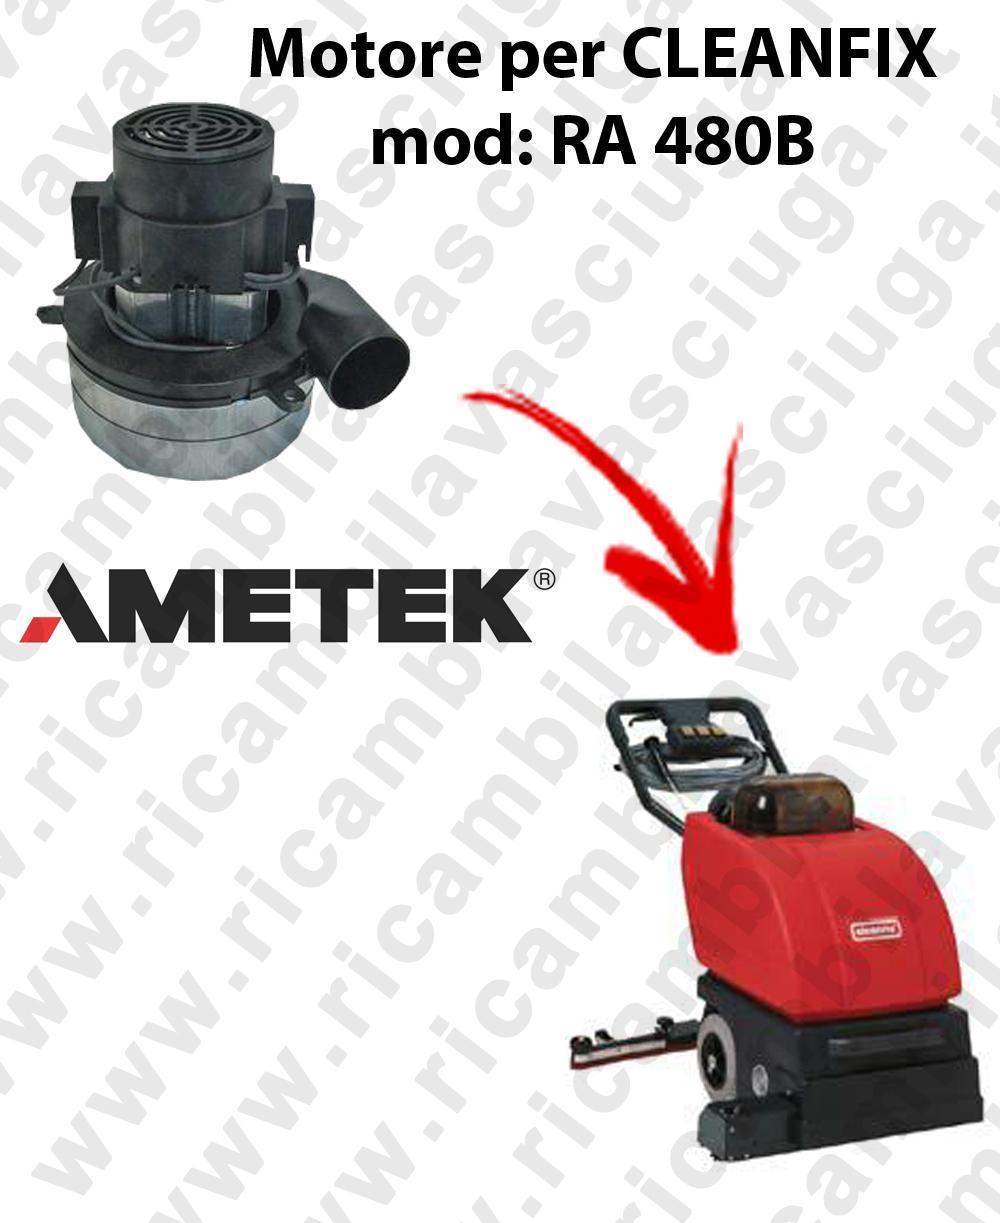 RA 480B Saugmotor AMETEK ITALIA für scheuersaugmaschinen CLEANFIX